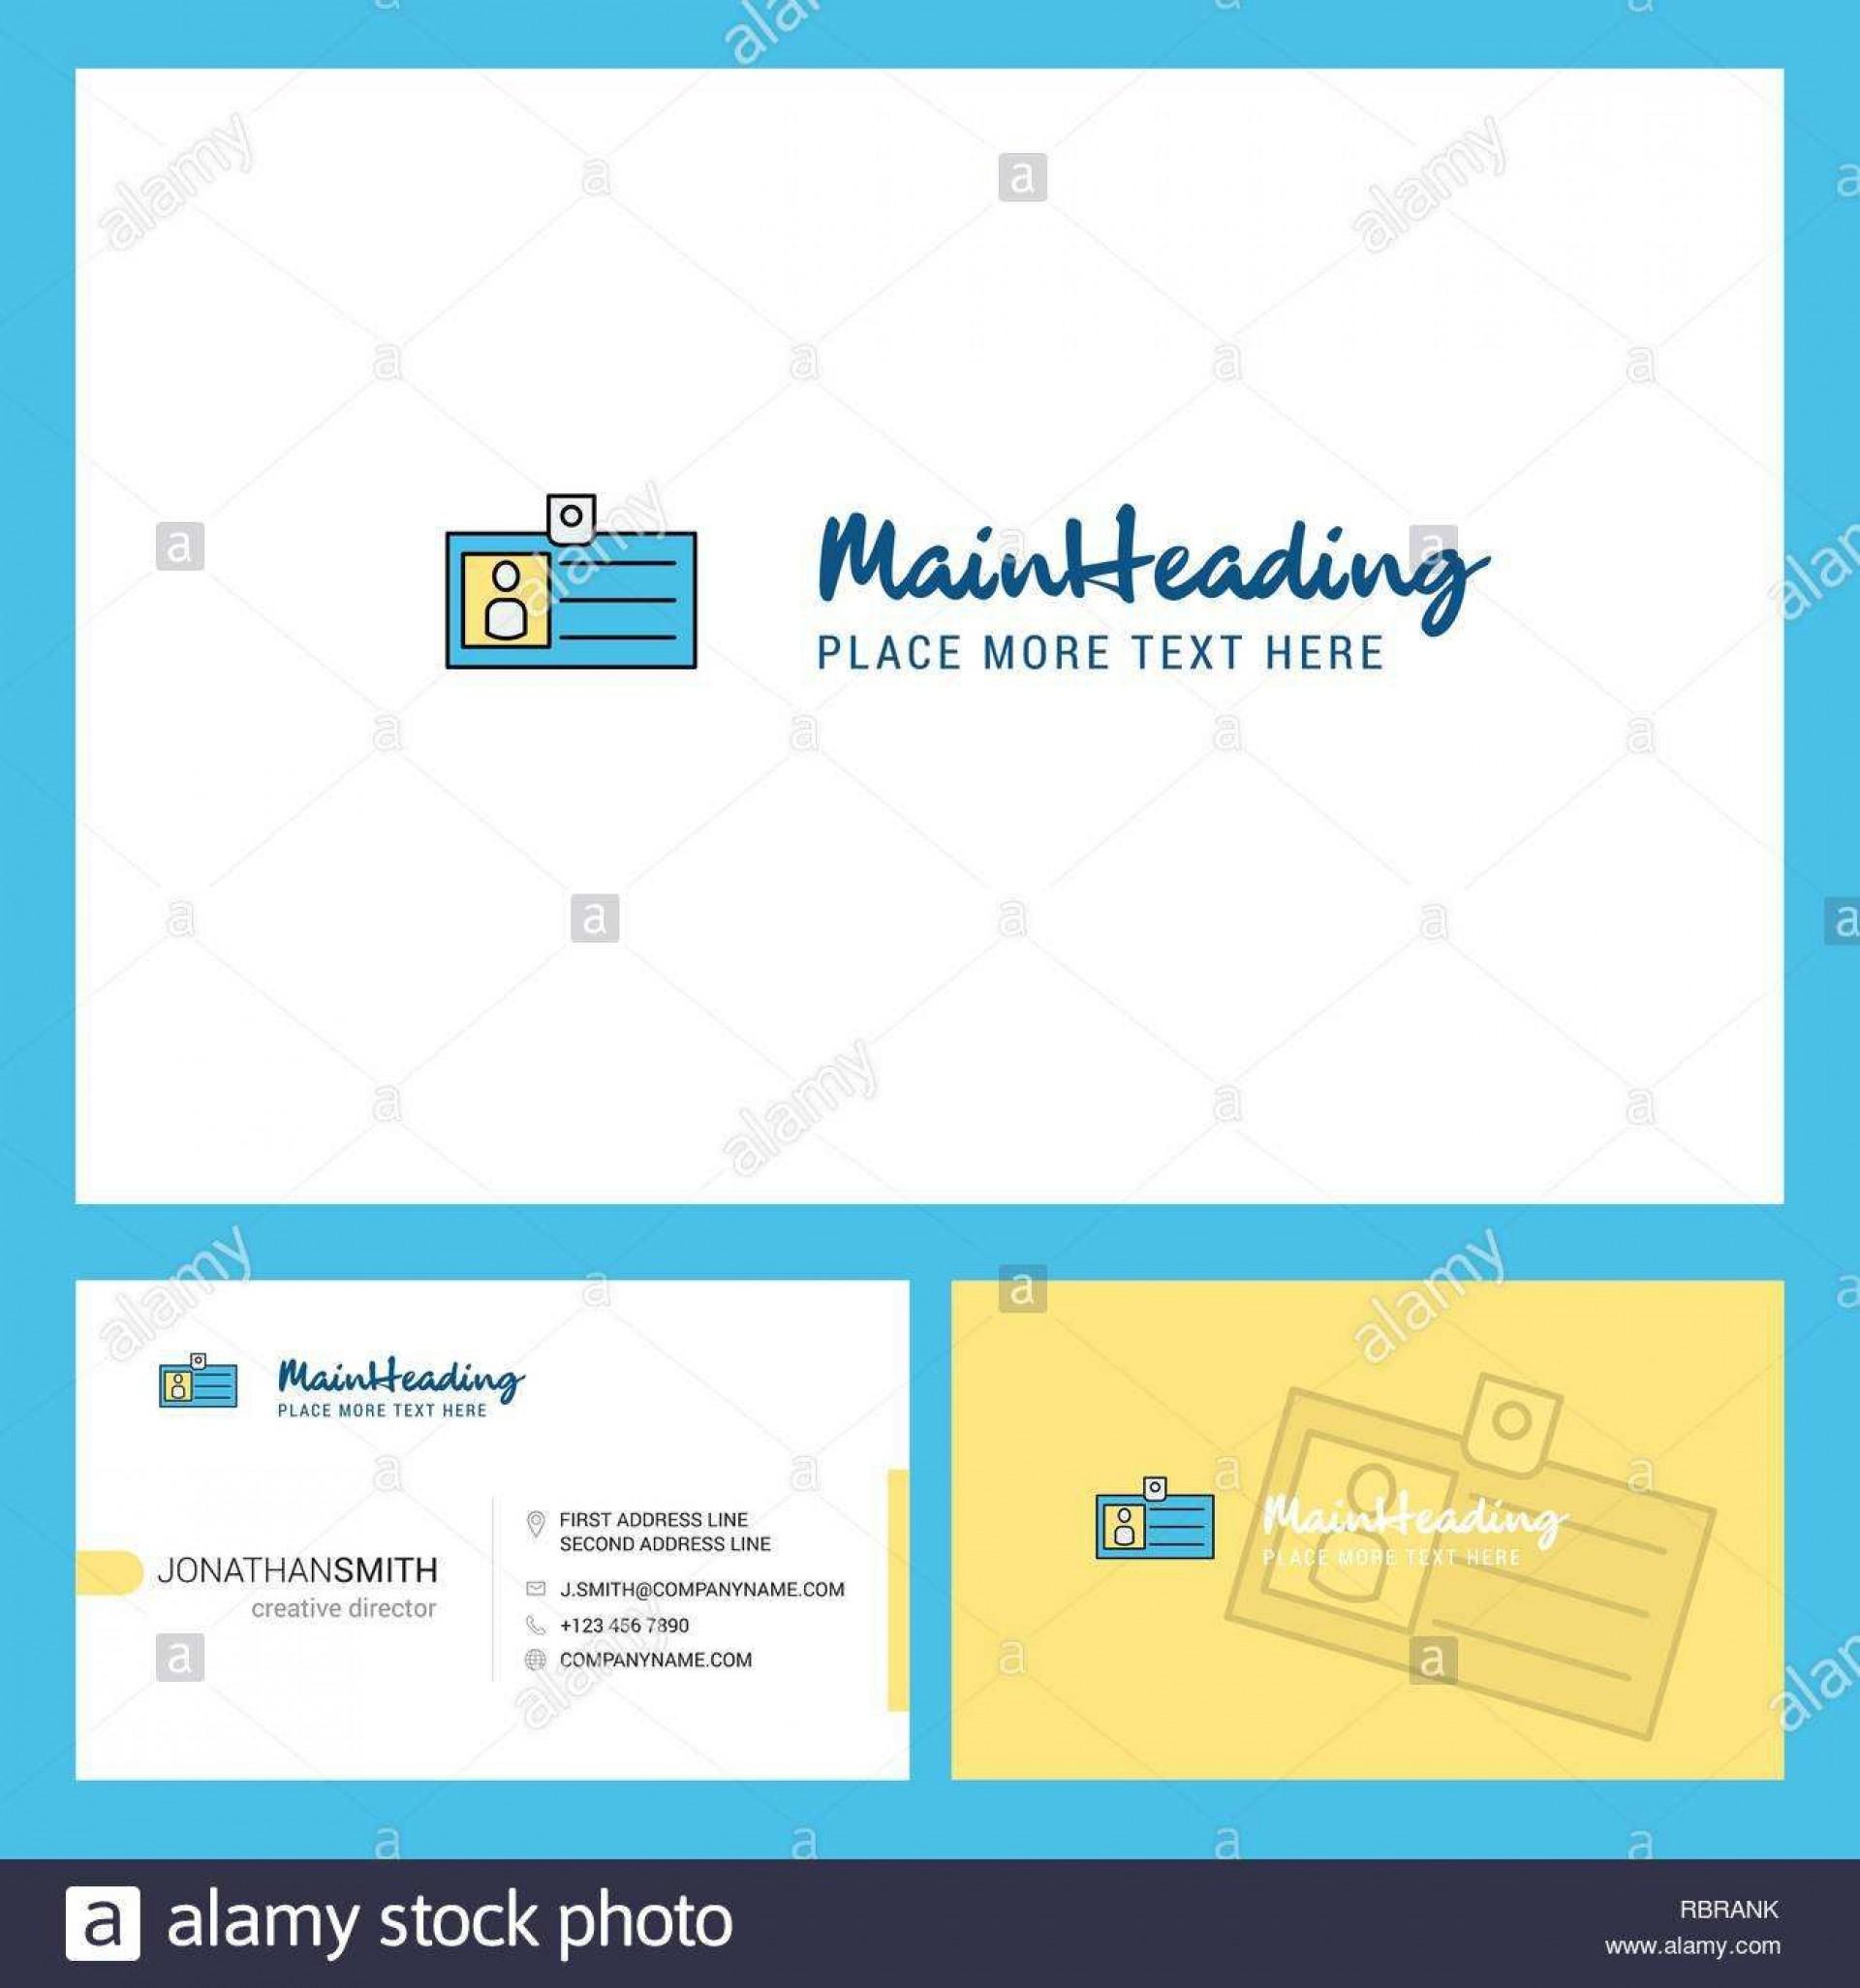 003 Beautiful Free Printable Id Card Template High Resolution  Templates Medical Editable1920